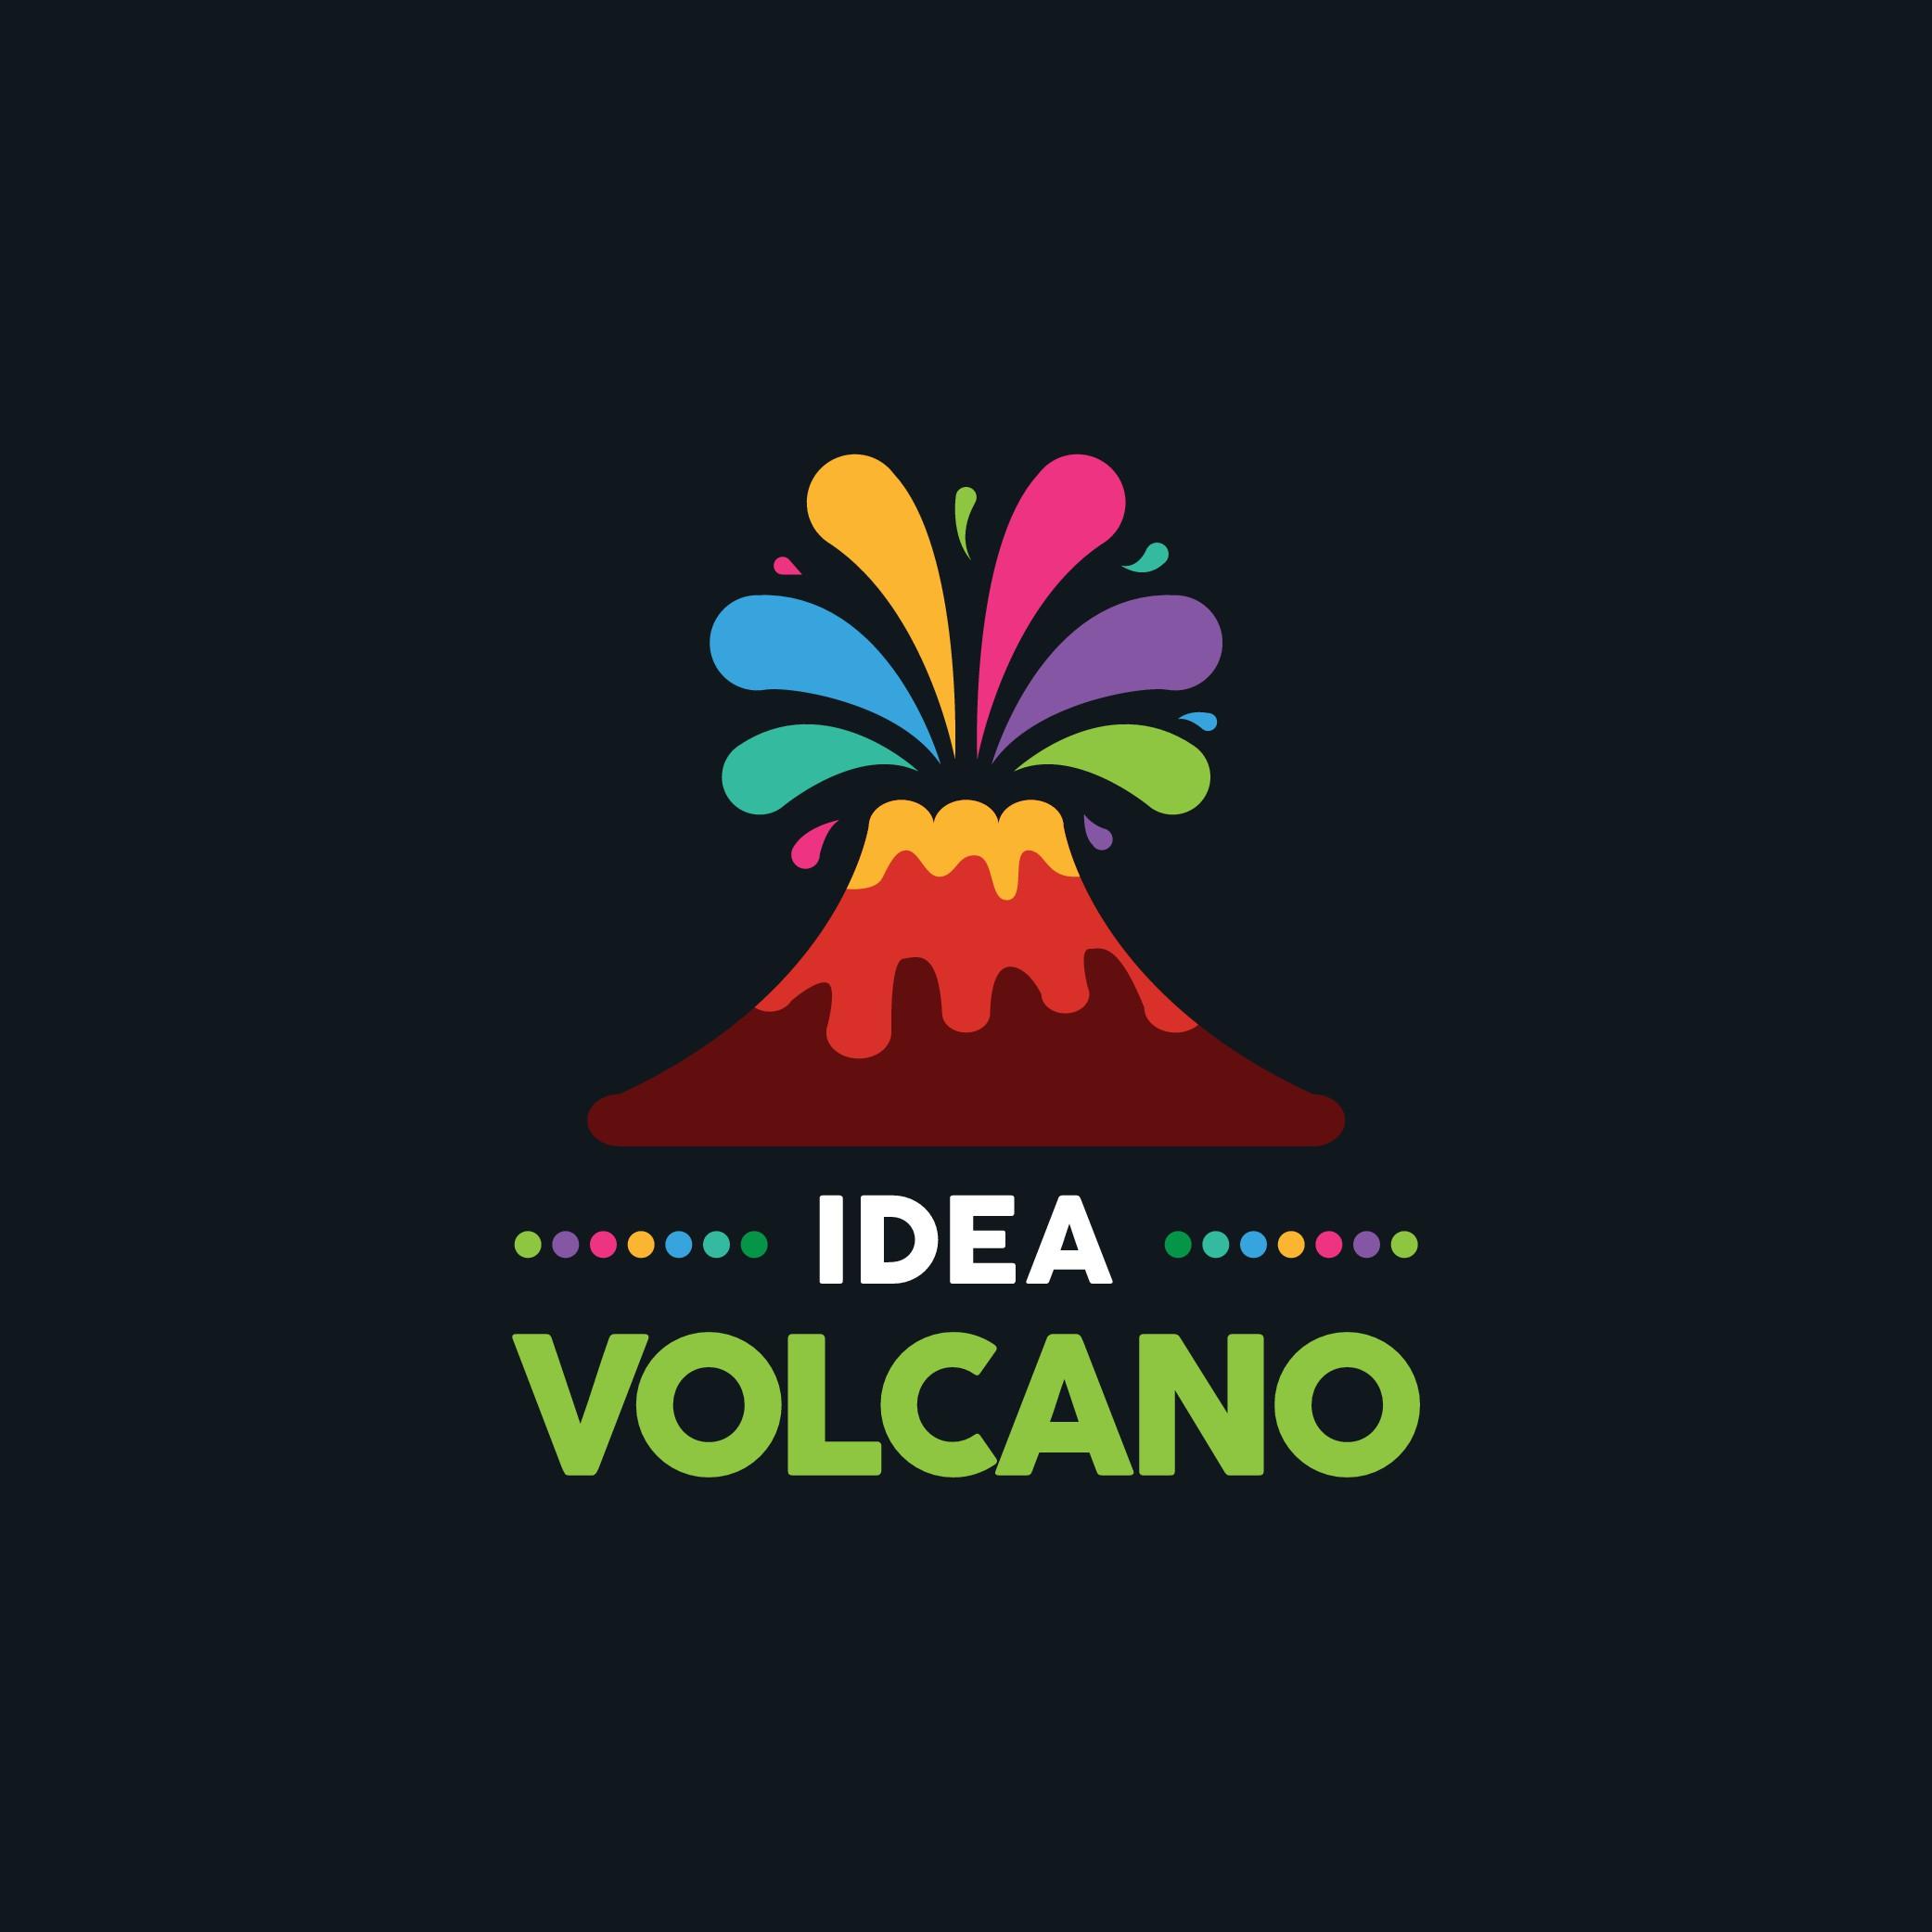 Make a colourful volcano logo for a creativity book